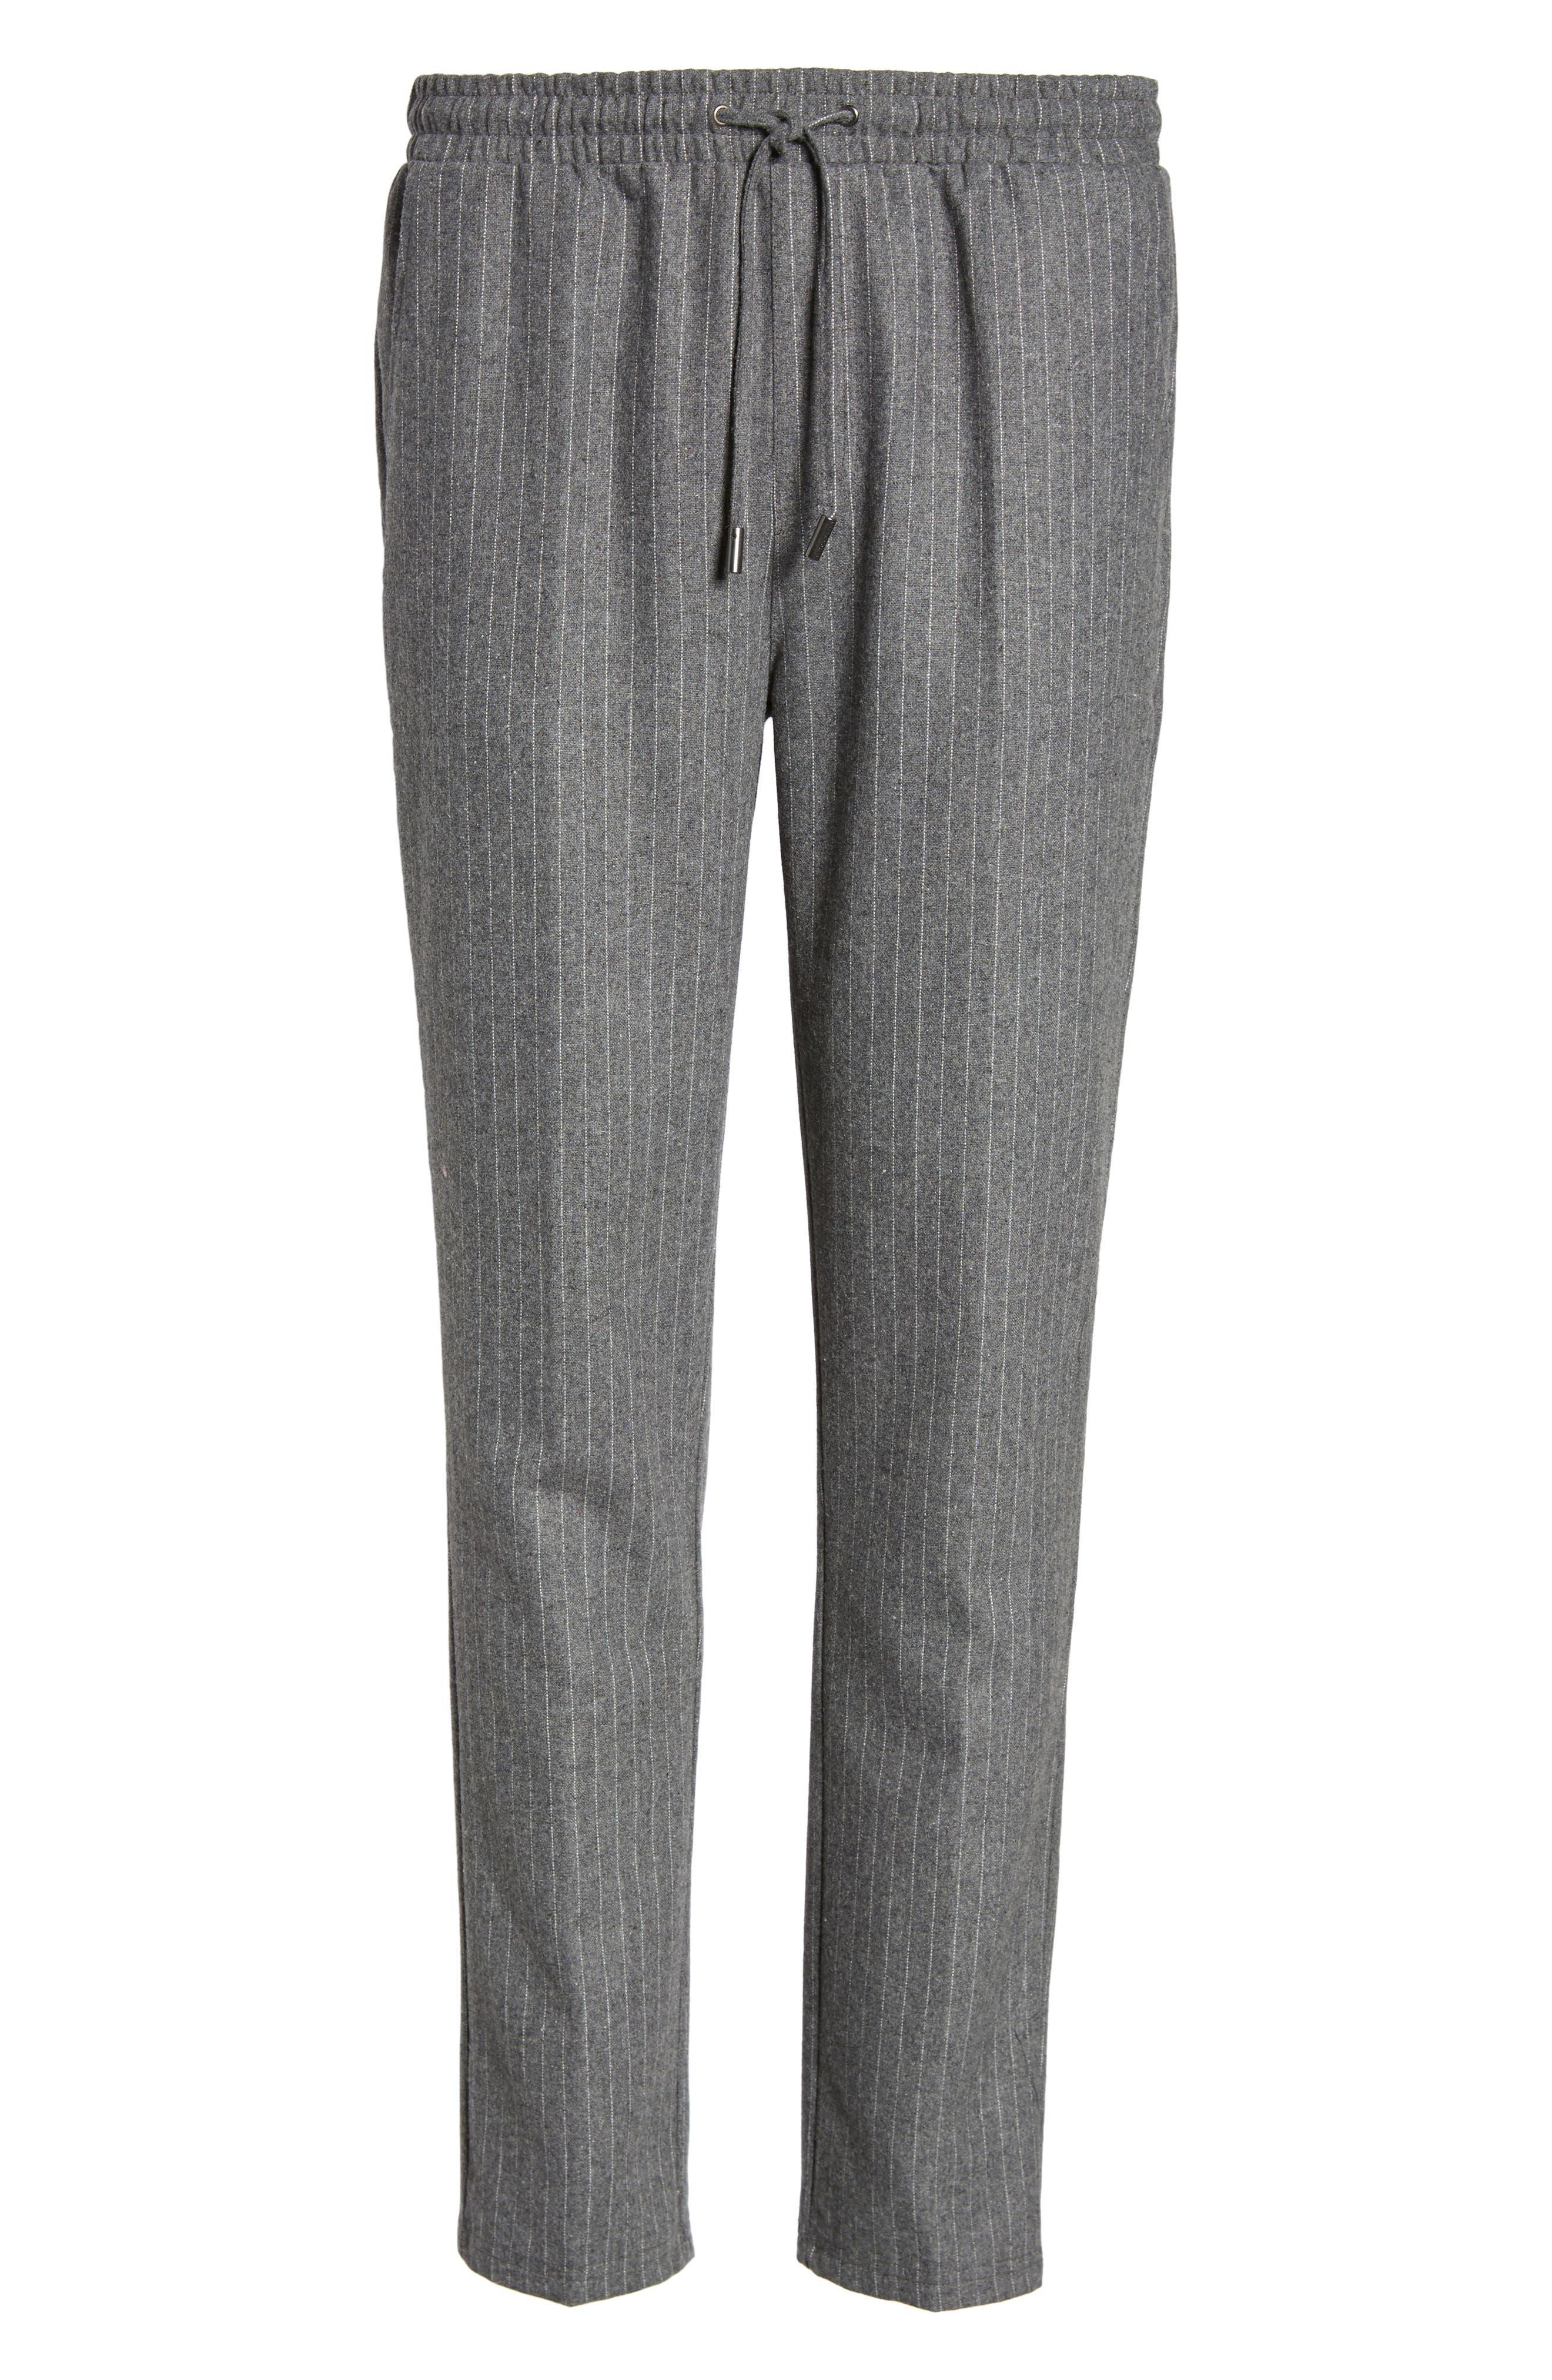 Pennyworth Pants,                             Alternate thumbnail 6, color,                             020